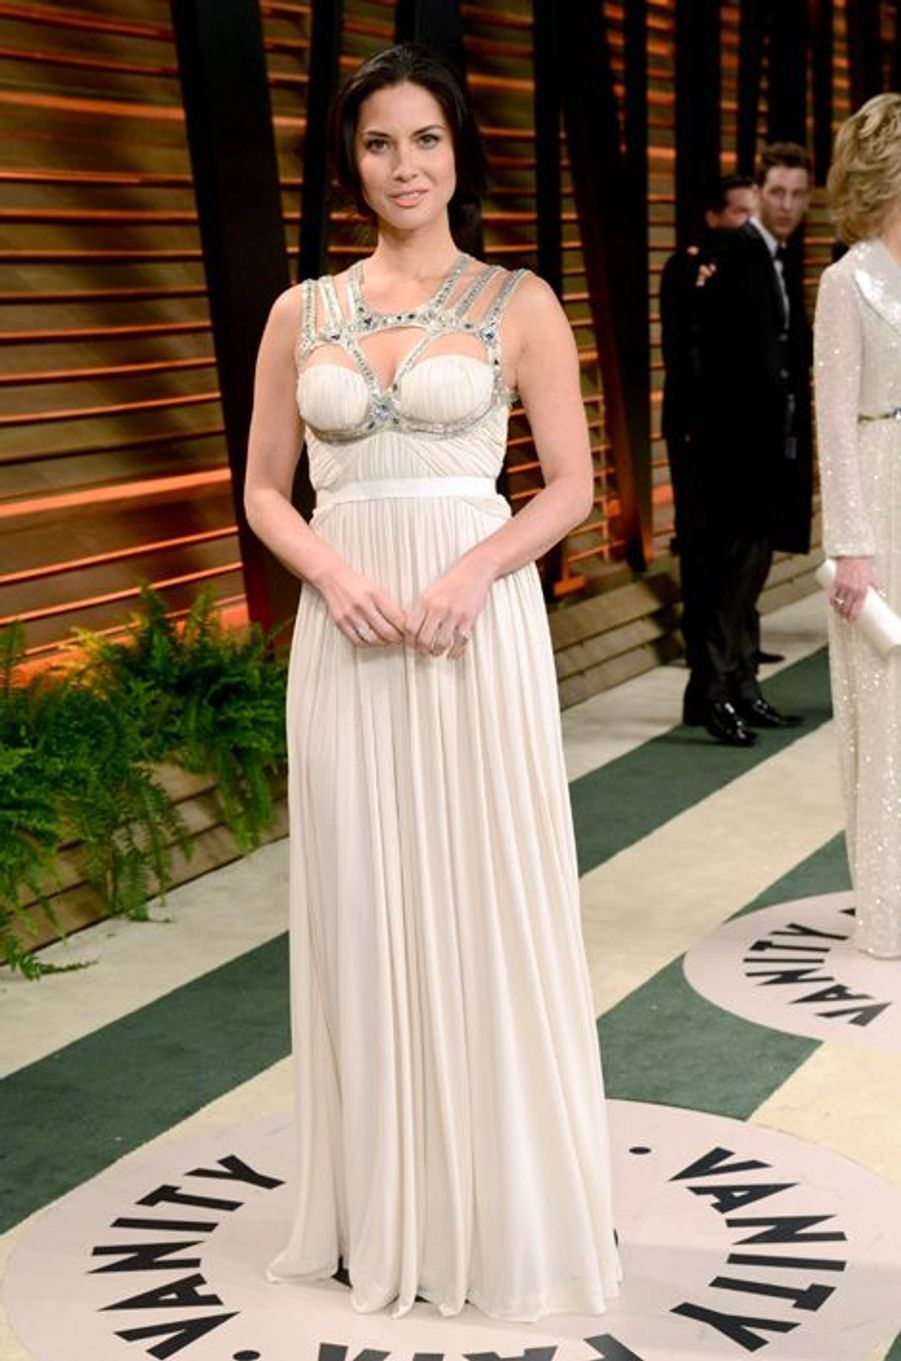 Olivia Munn en Alexander McQueen à la soirée post-Oscars, en mars 2014